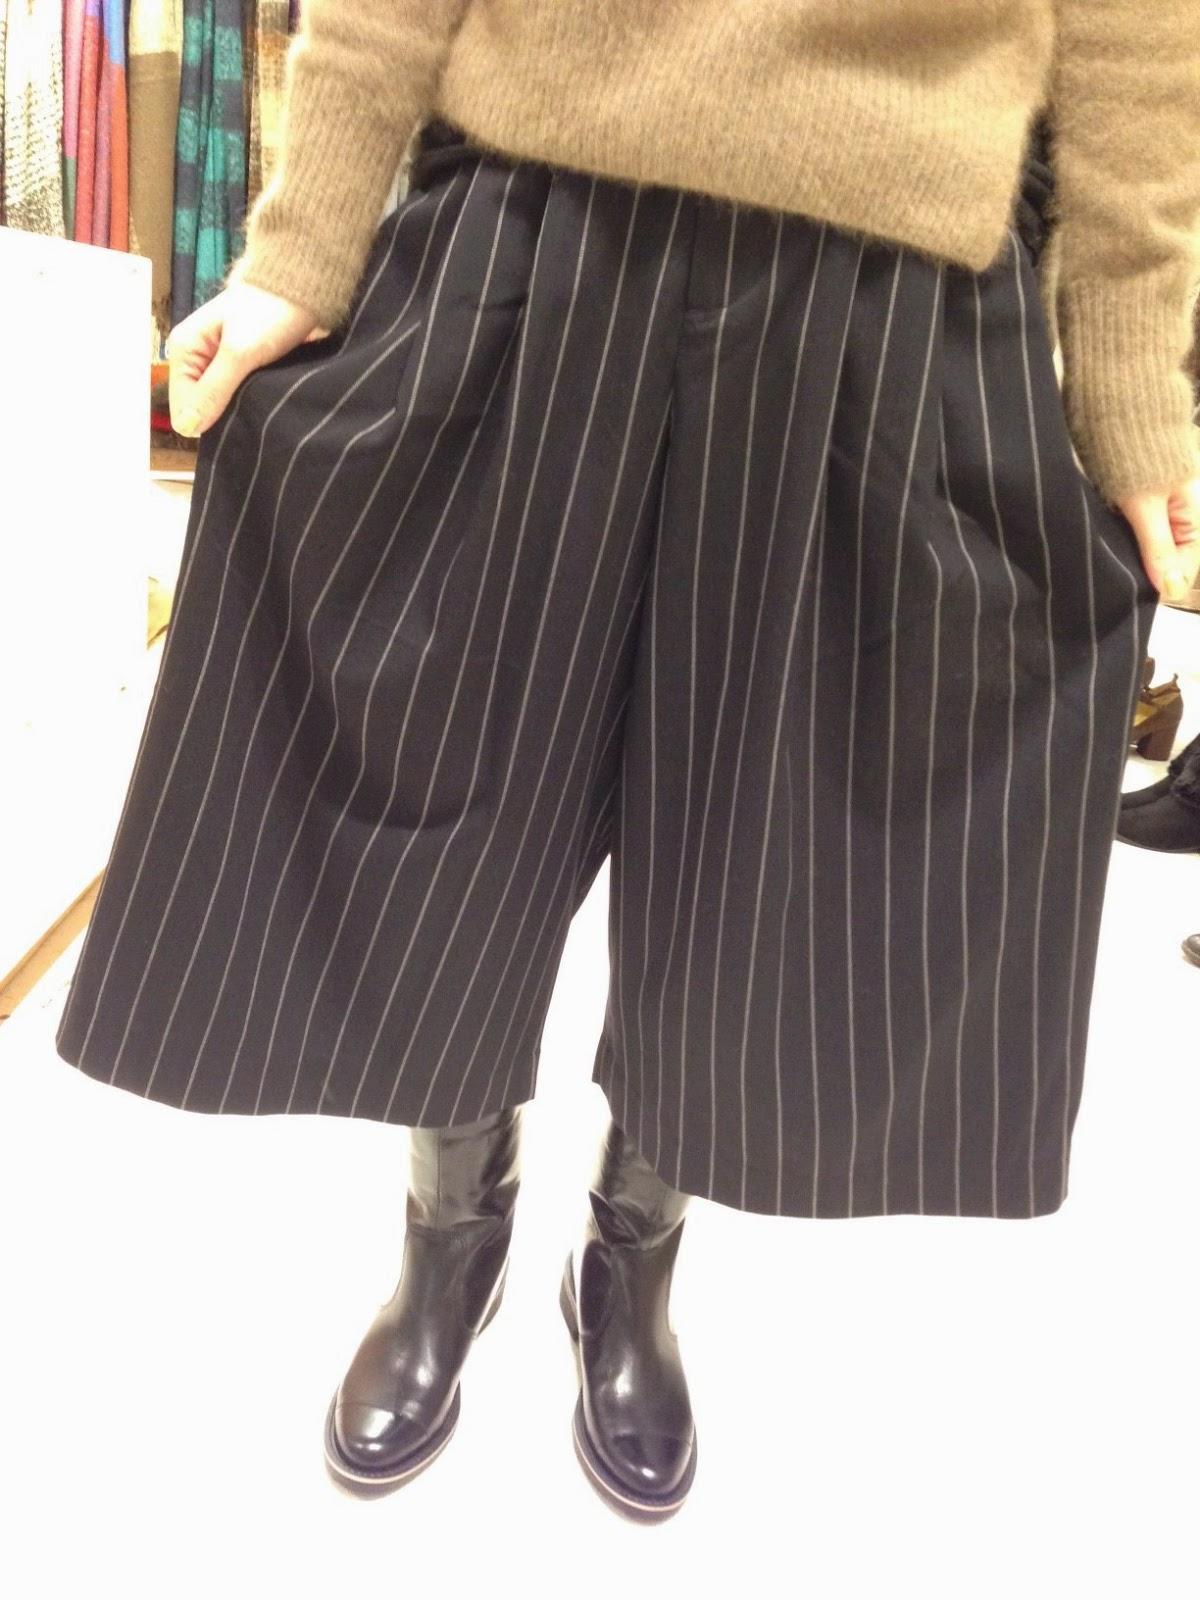 pas de calais【パドカレ】レトロパイルインレーコート・ストライプガウチョパンツ◆香川・綾川店